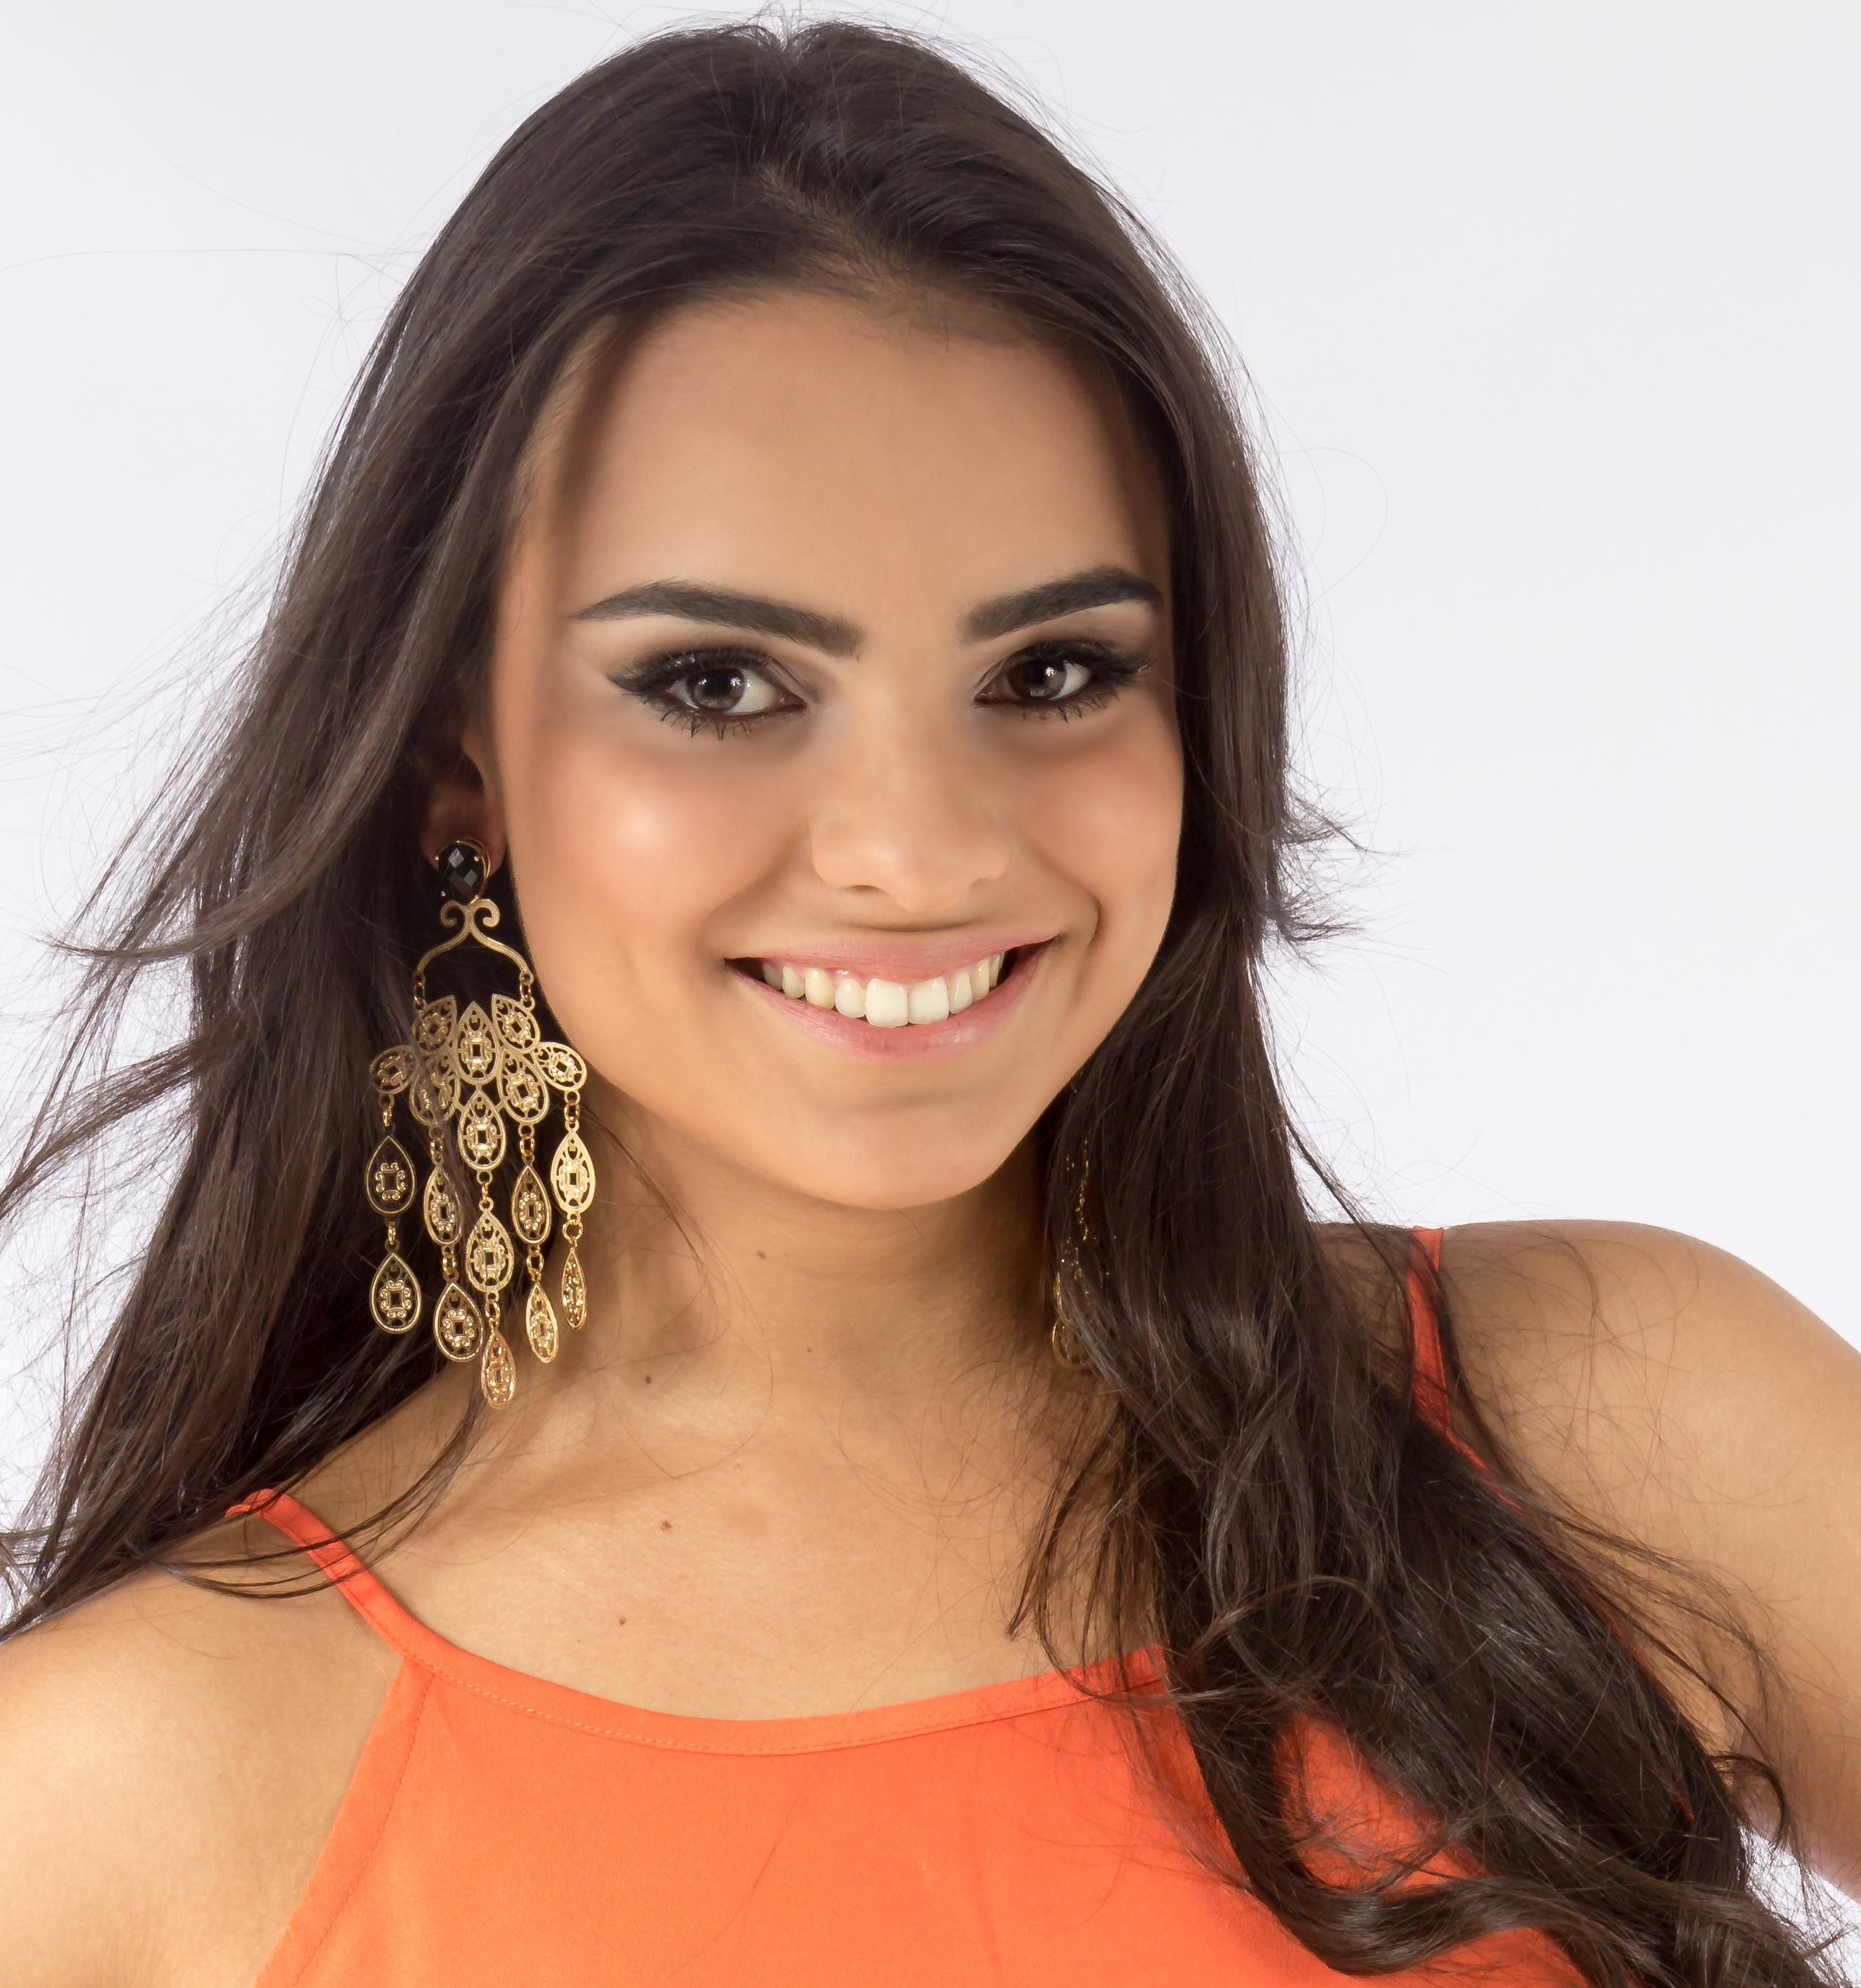 Pamela Melro